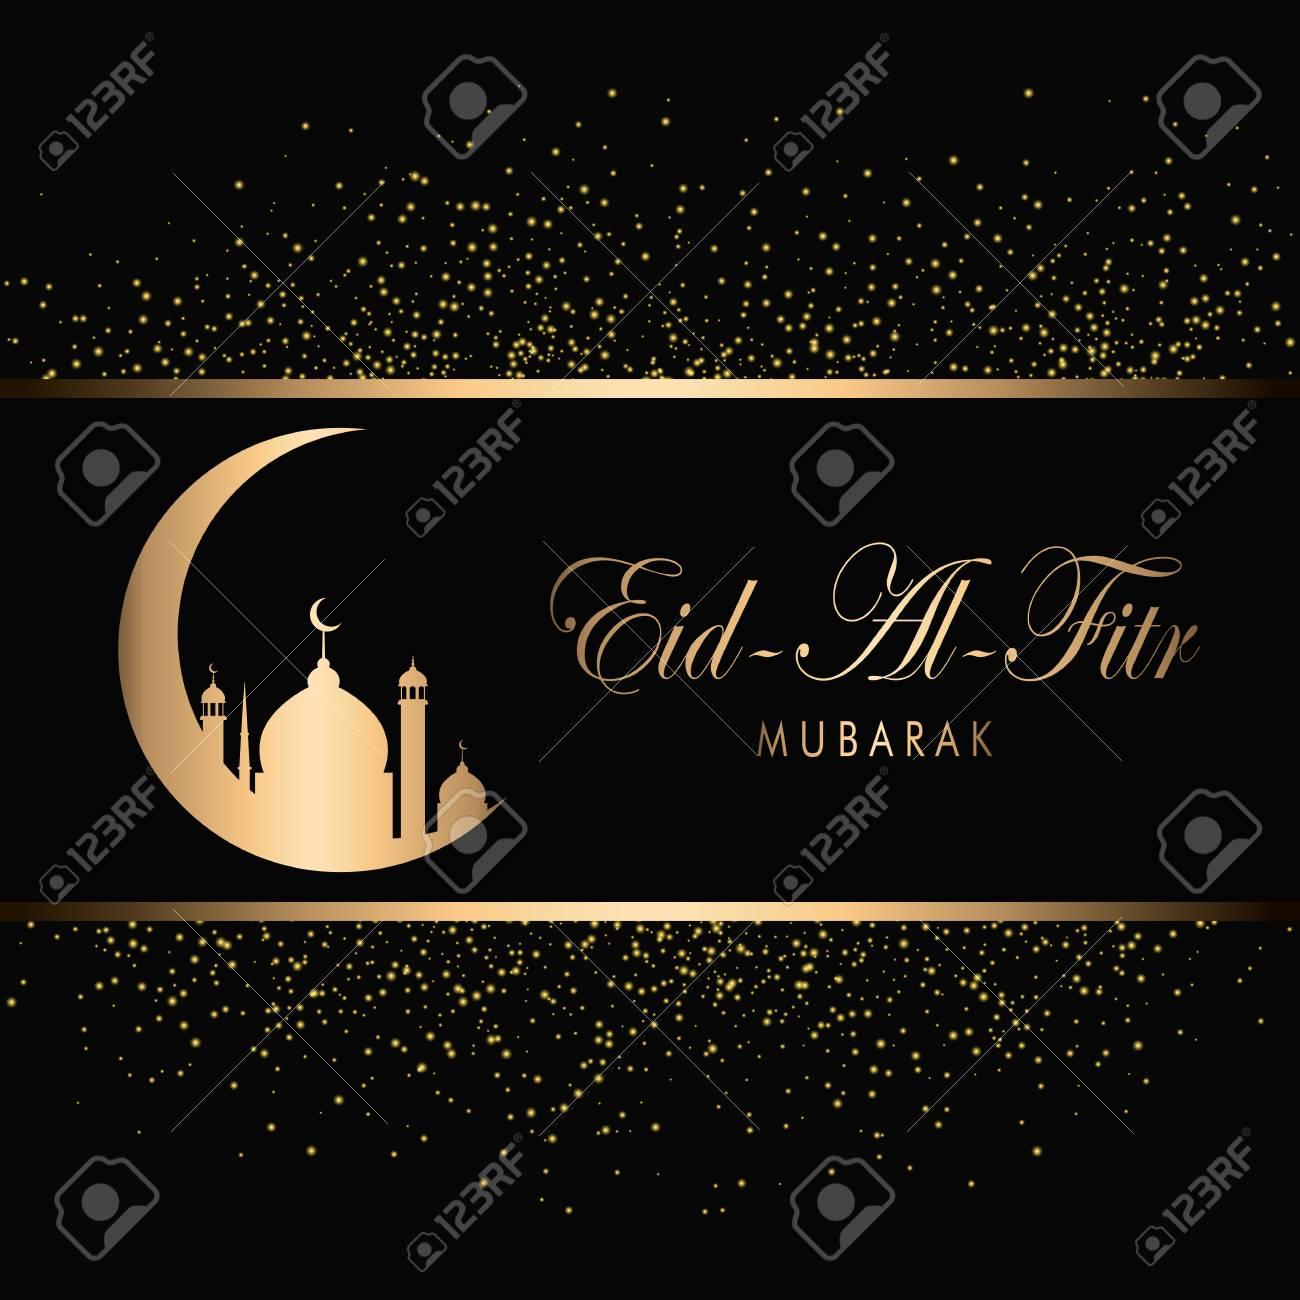 eid mubarak design background gold sparkling vector illustration royalty free cliparts vectors and stock illustration image 99980084 eid mubarak design background gold sparkling vector illustration